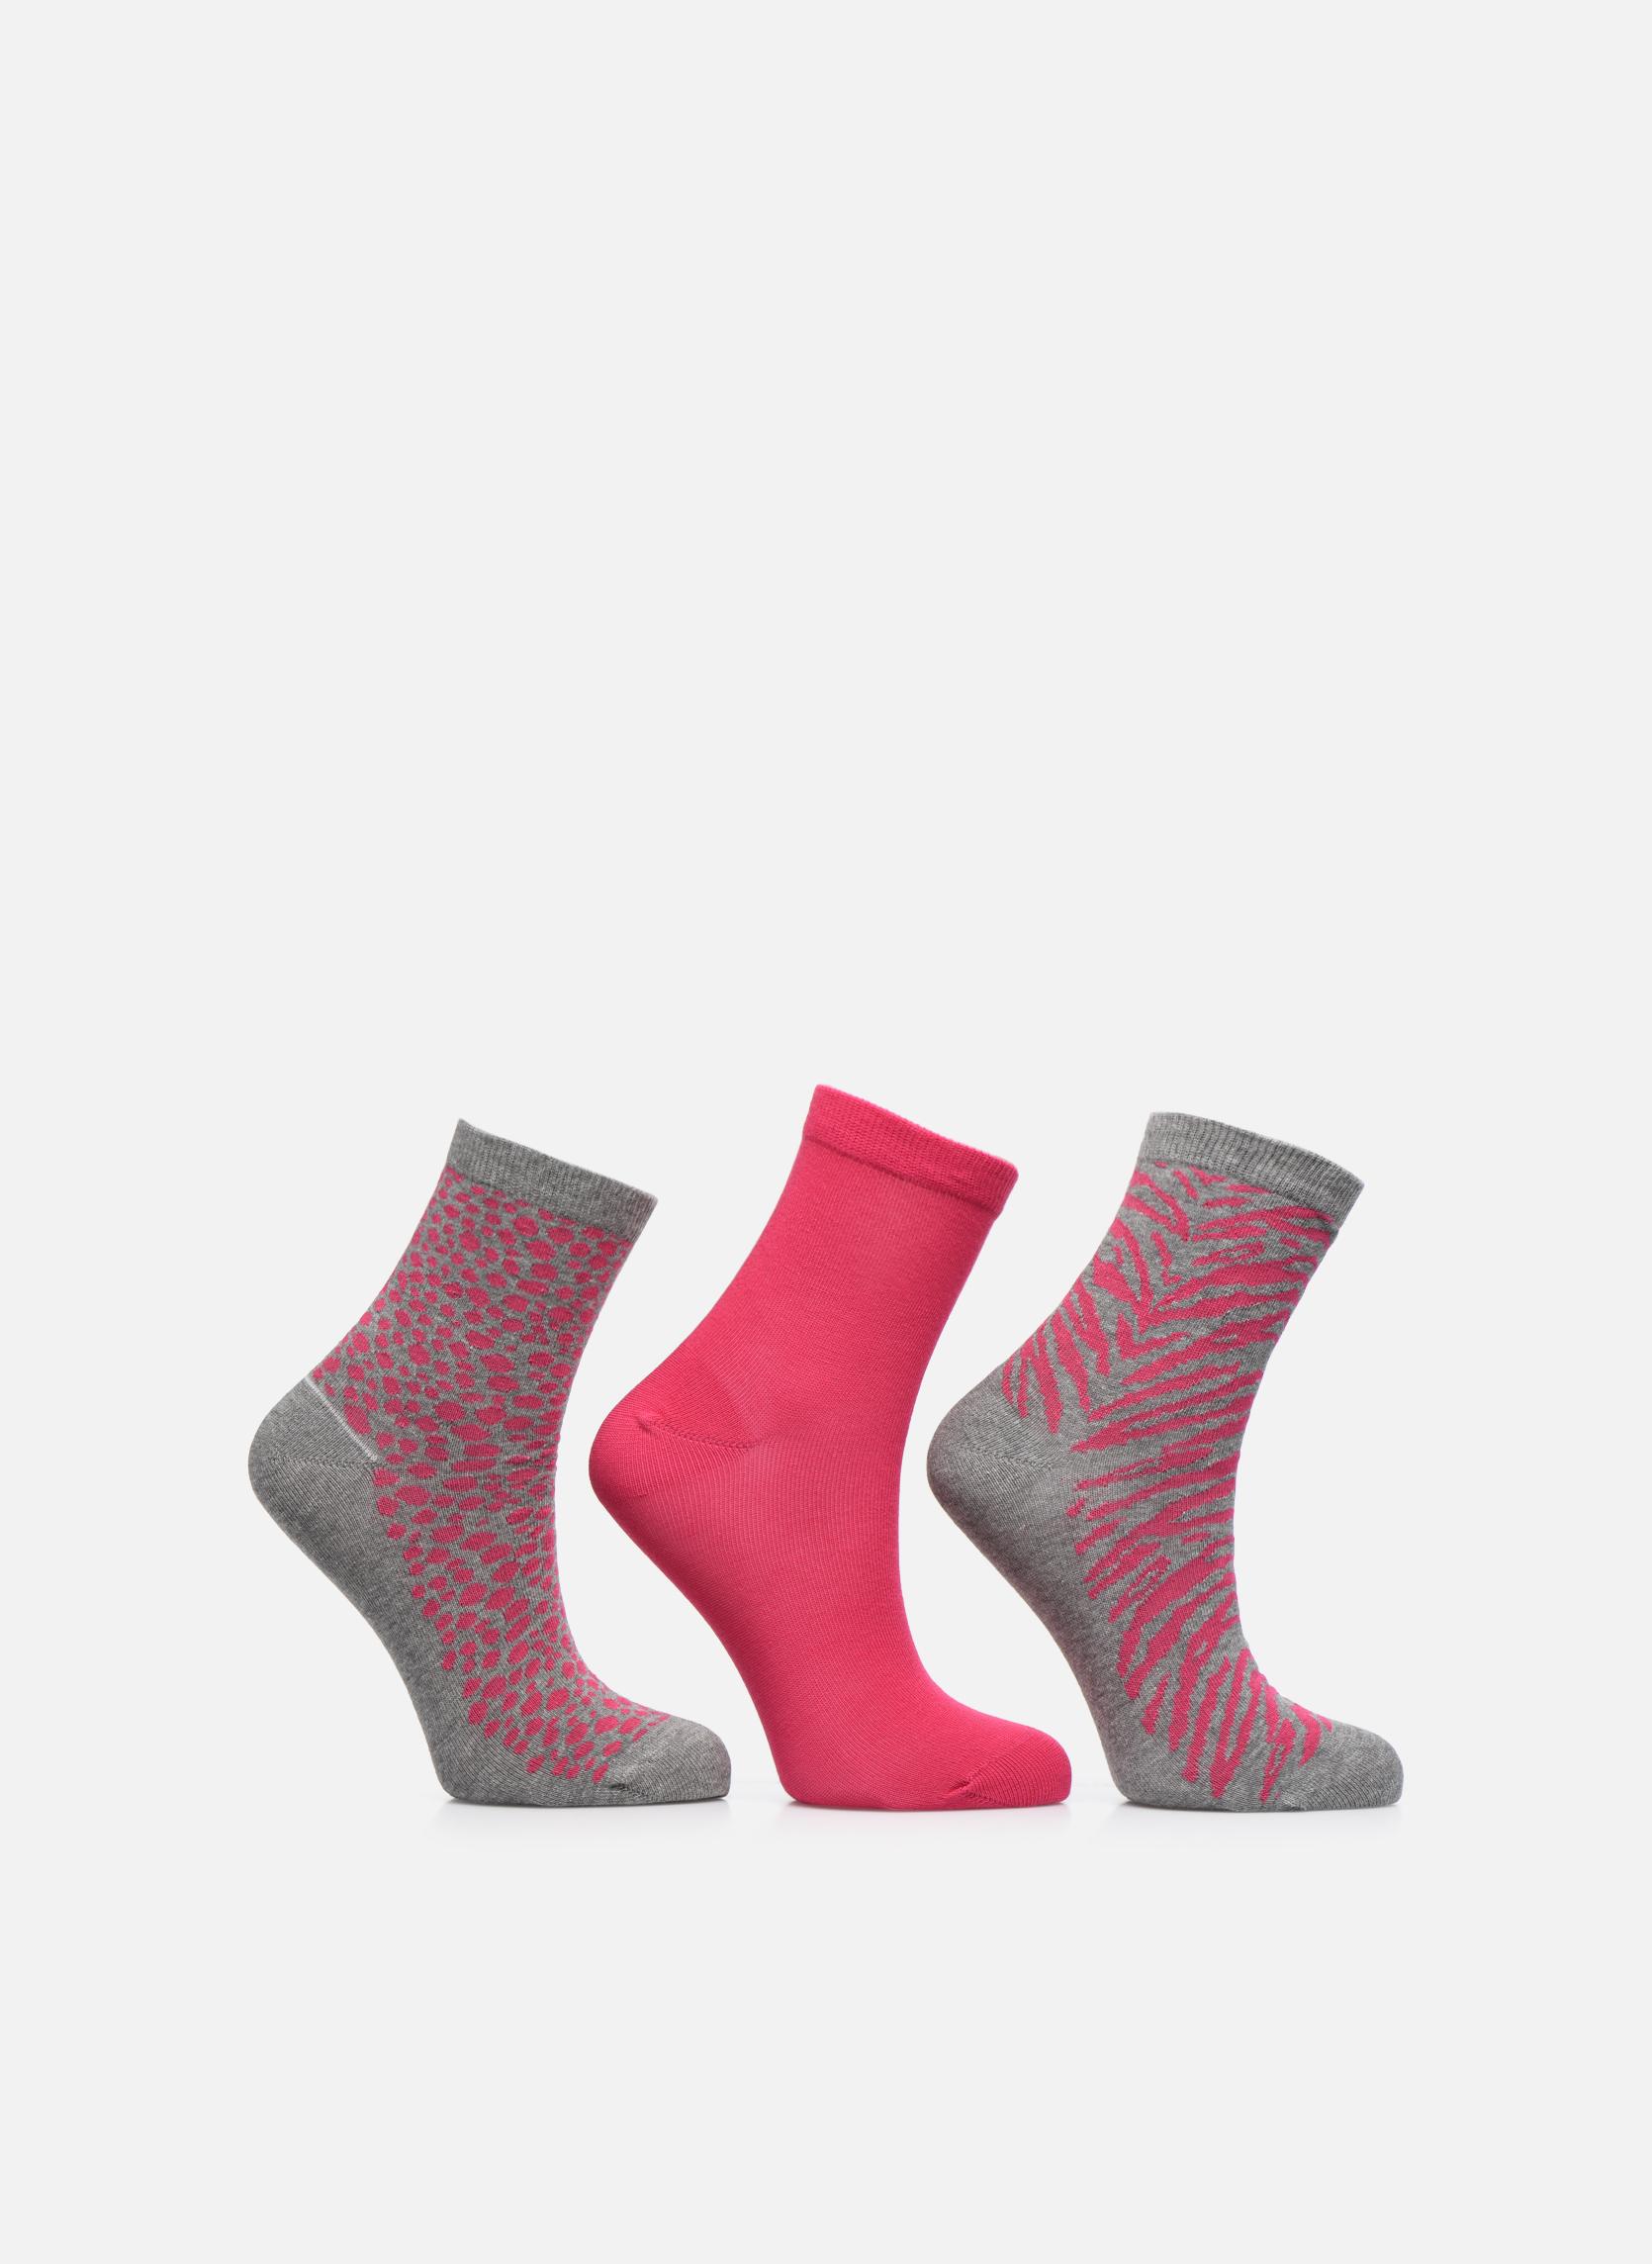 gris chiné pink